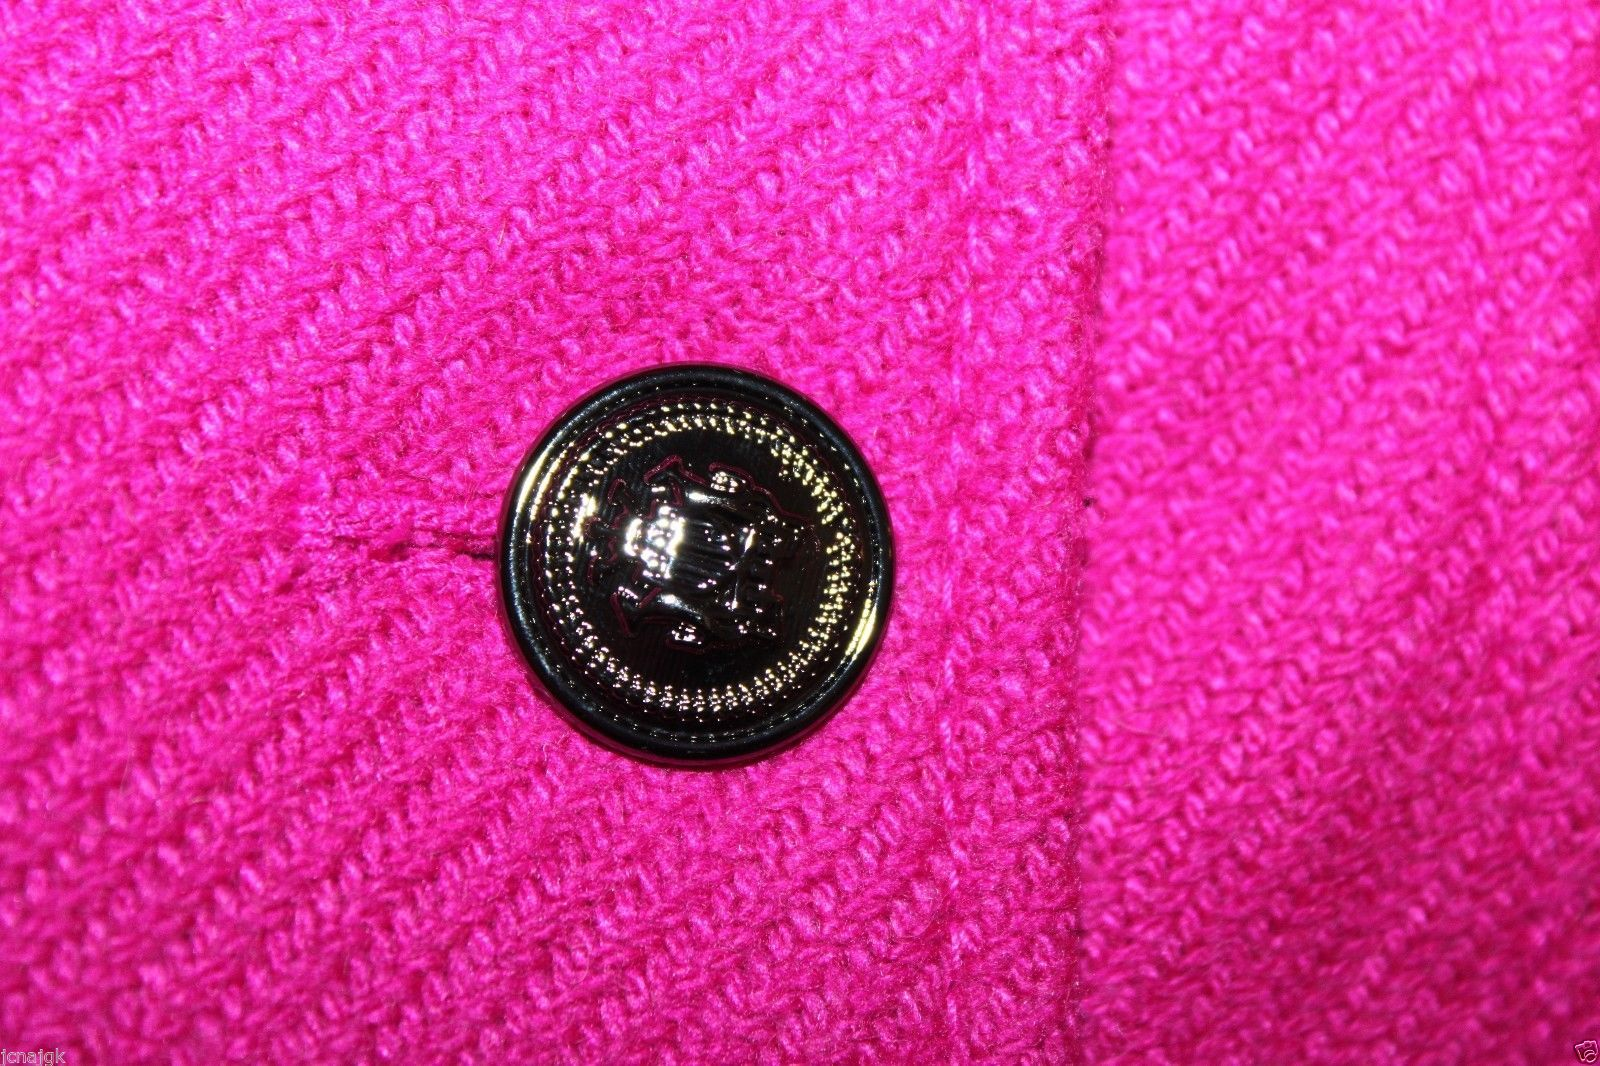 Gap Kids NWT Girl's XXL 13 Pink Boucle' Wool Blend Pea Coat Jacket